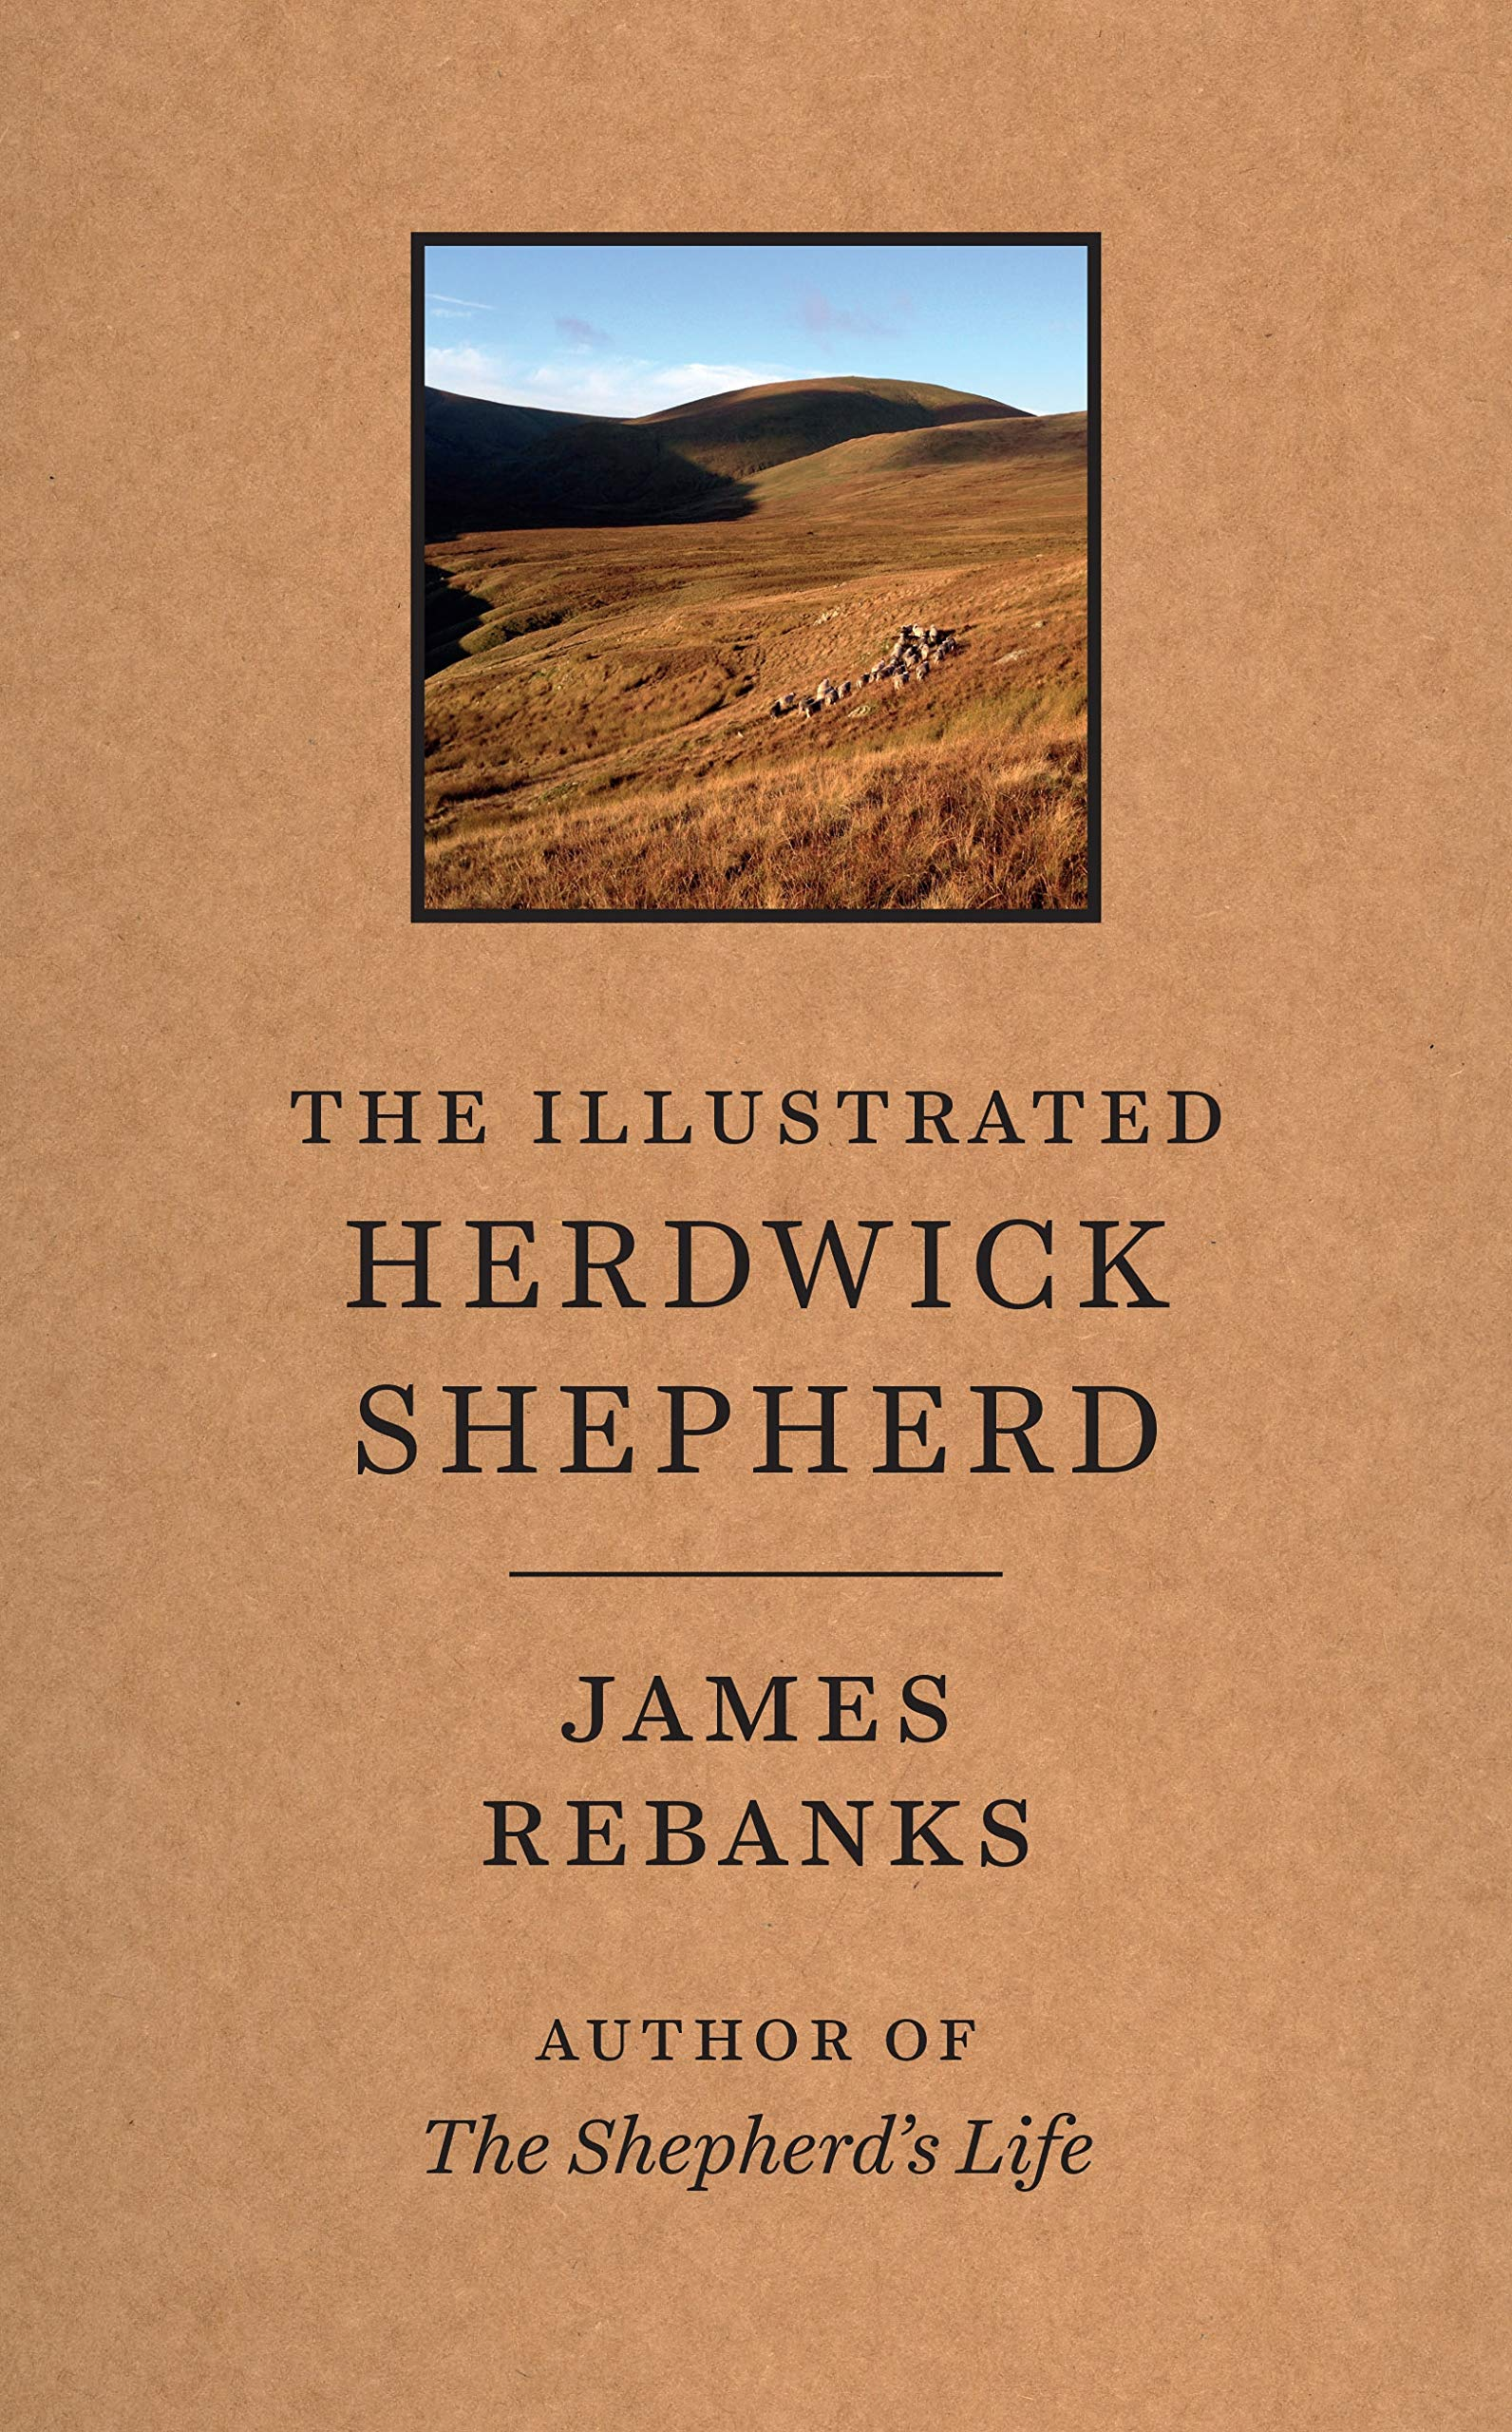 illustrated herdwick shepherd.jpg